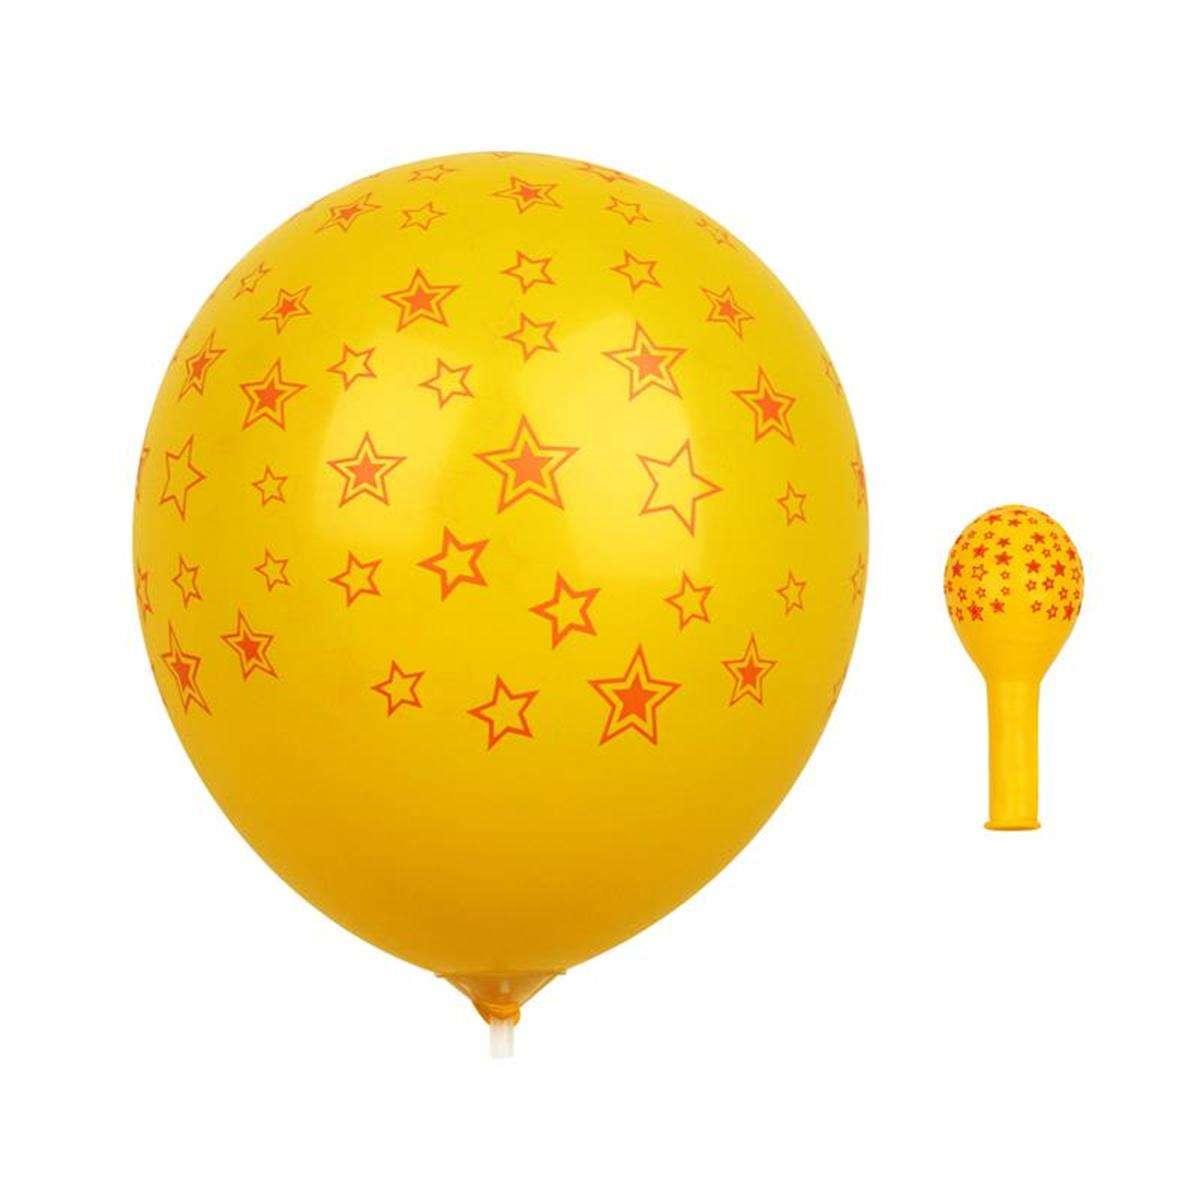 <span class=keywords><strong>100</strong></span> pcs Grau <span class=keywords><strong>Luftballons</strong></span> Baby <span class=keywords><strong>Rosa</strong></span> <span class=keywords><strong>Luftballons</strong></span> Weiß Ballons für Mädchen Baby Dusche